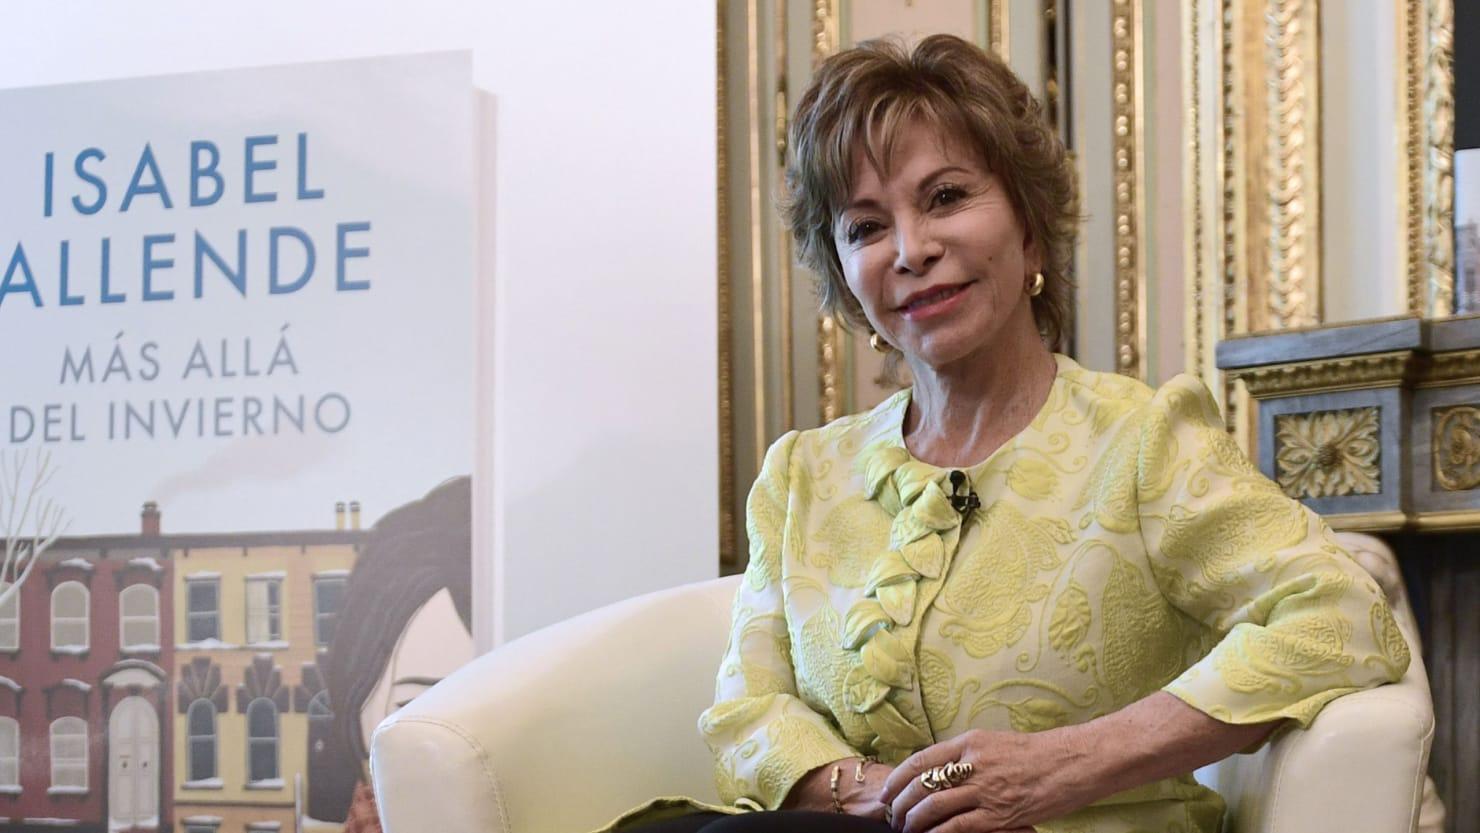 Author Isabel Allende: 'I Have a Lover at 76'